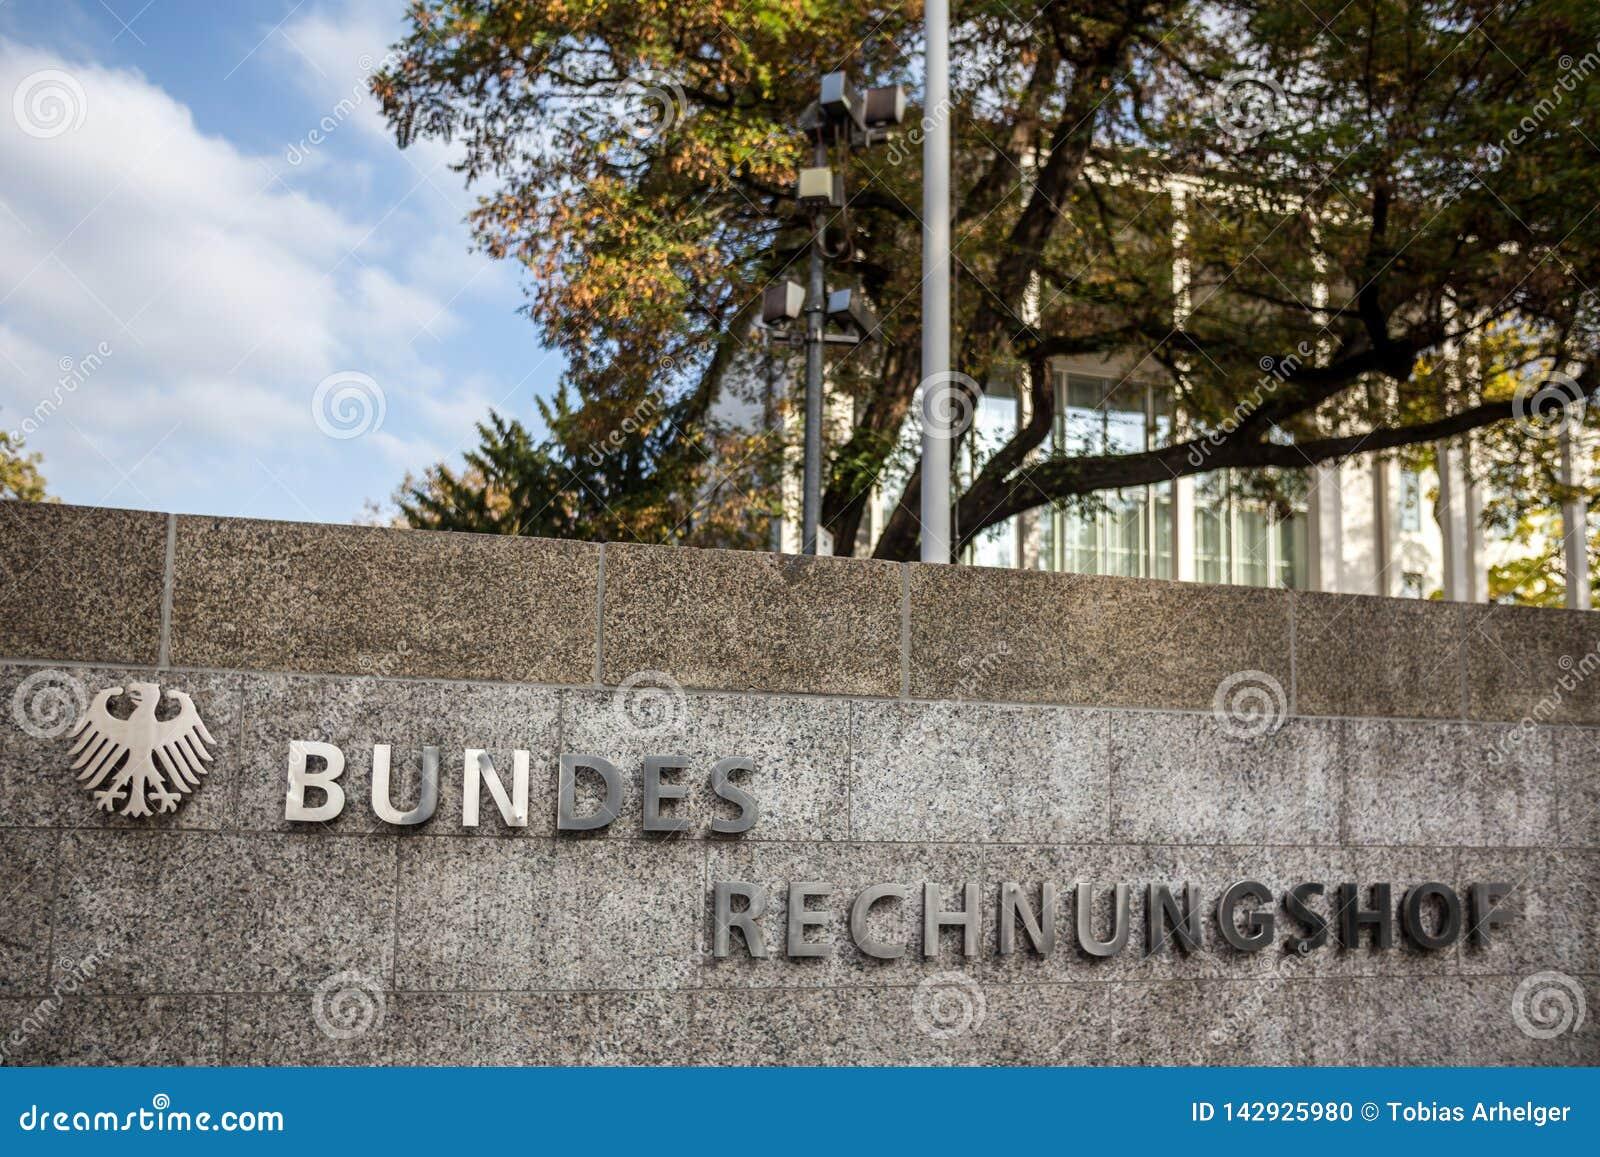 Niemiecki bundesrechnungshof w Bonn Germany